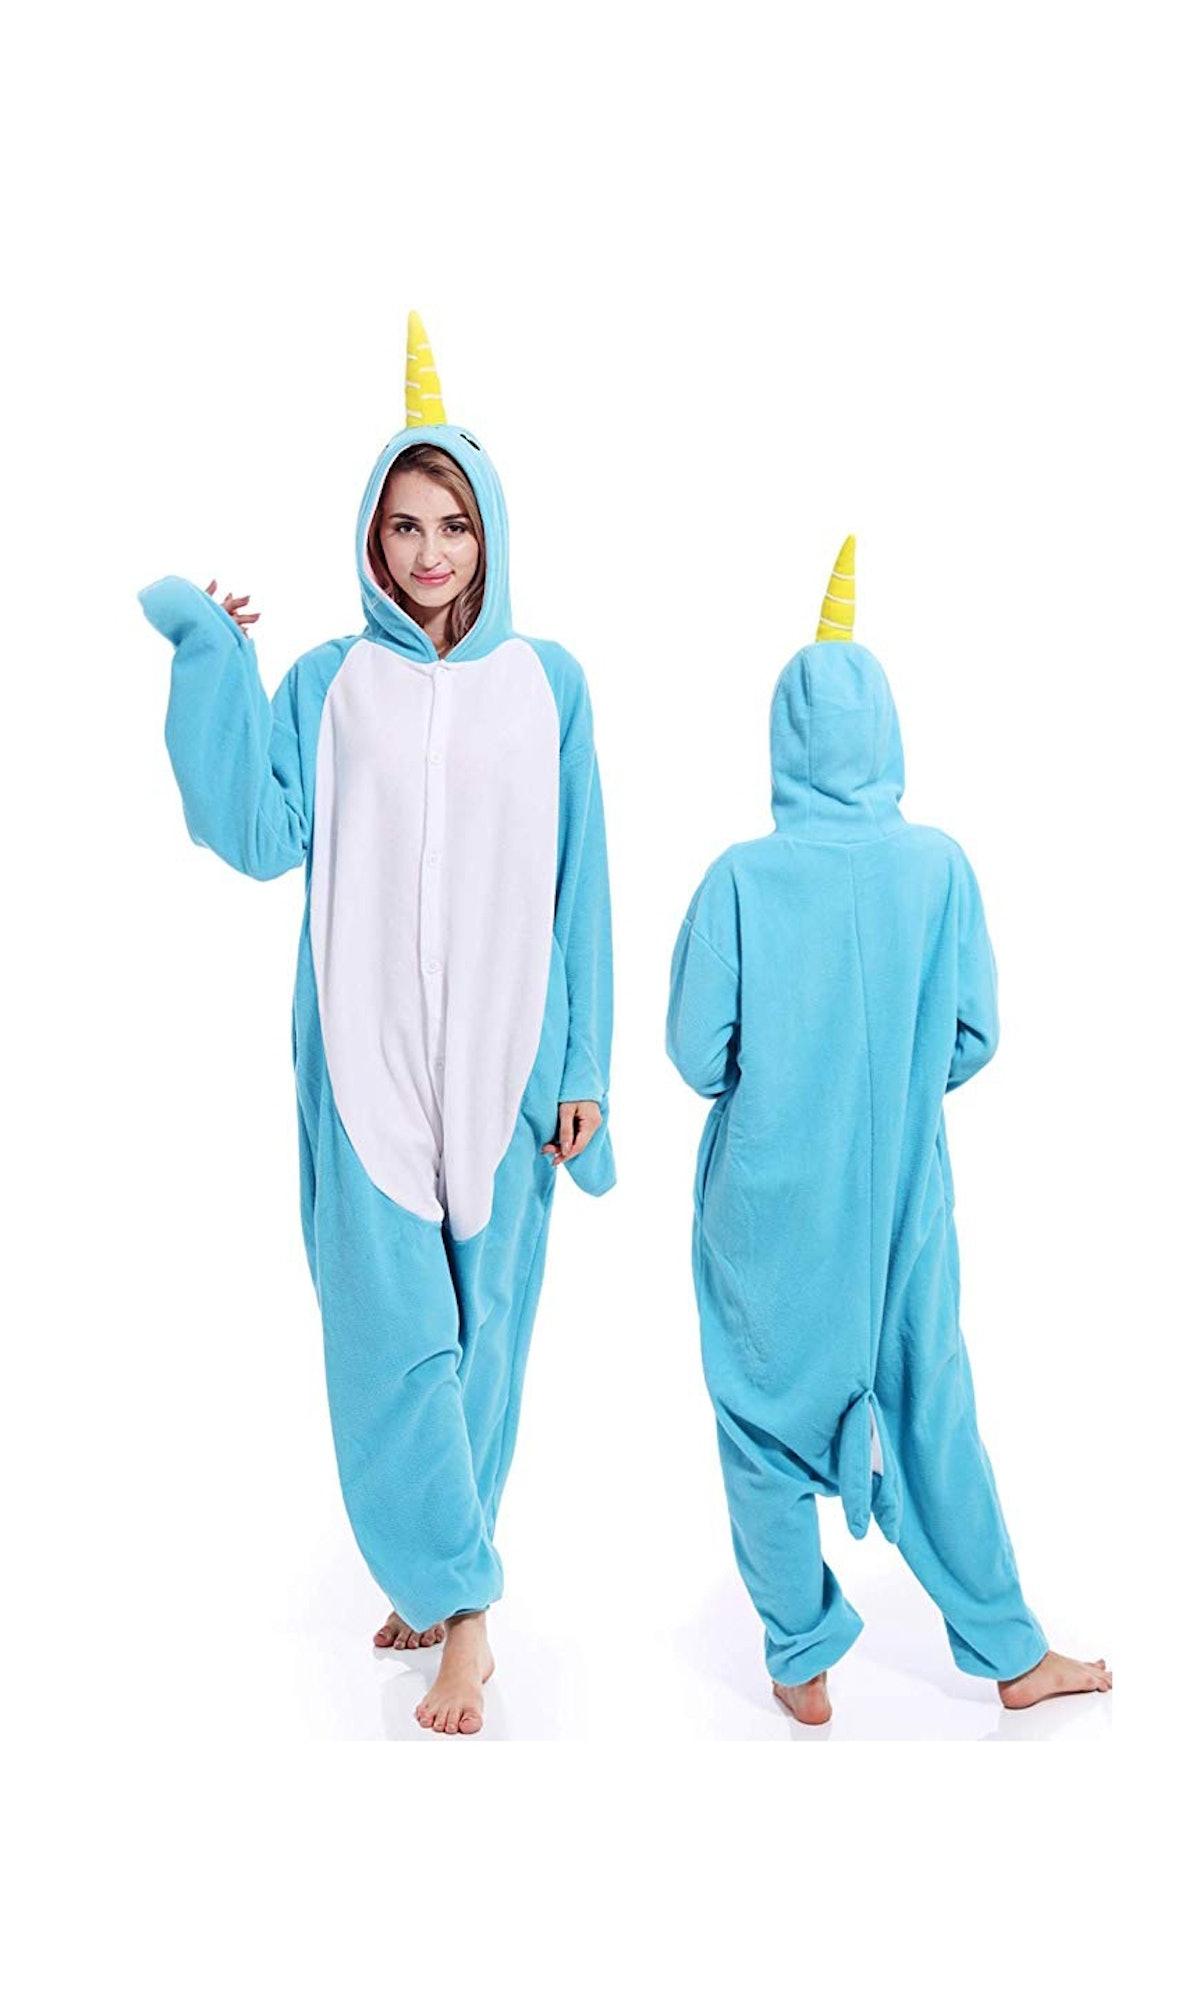 Unisex Narwhal Onesies Adult Pajamas Animal Halloween Costume Cosplay One Piece Sleepwear for Women Men